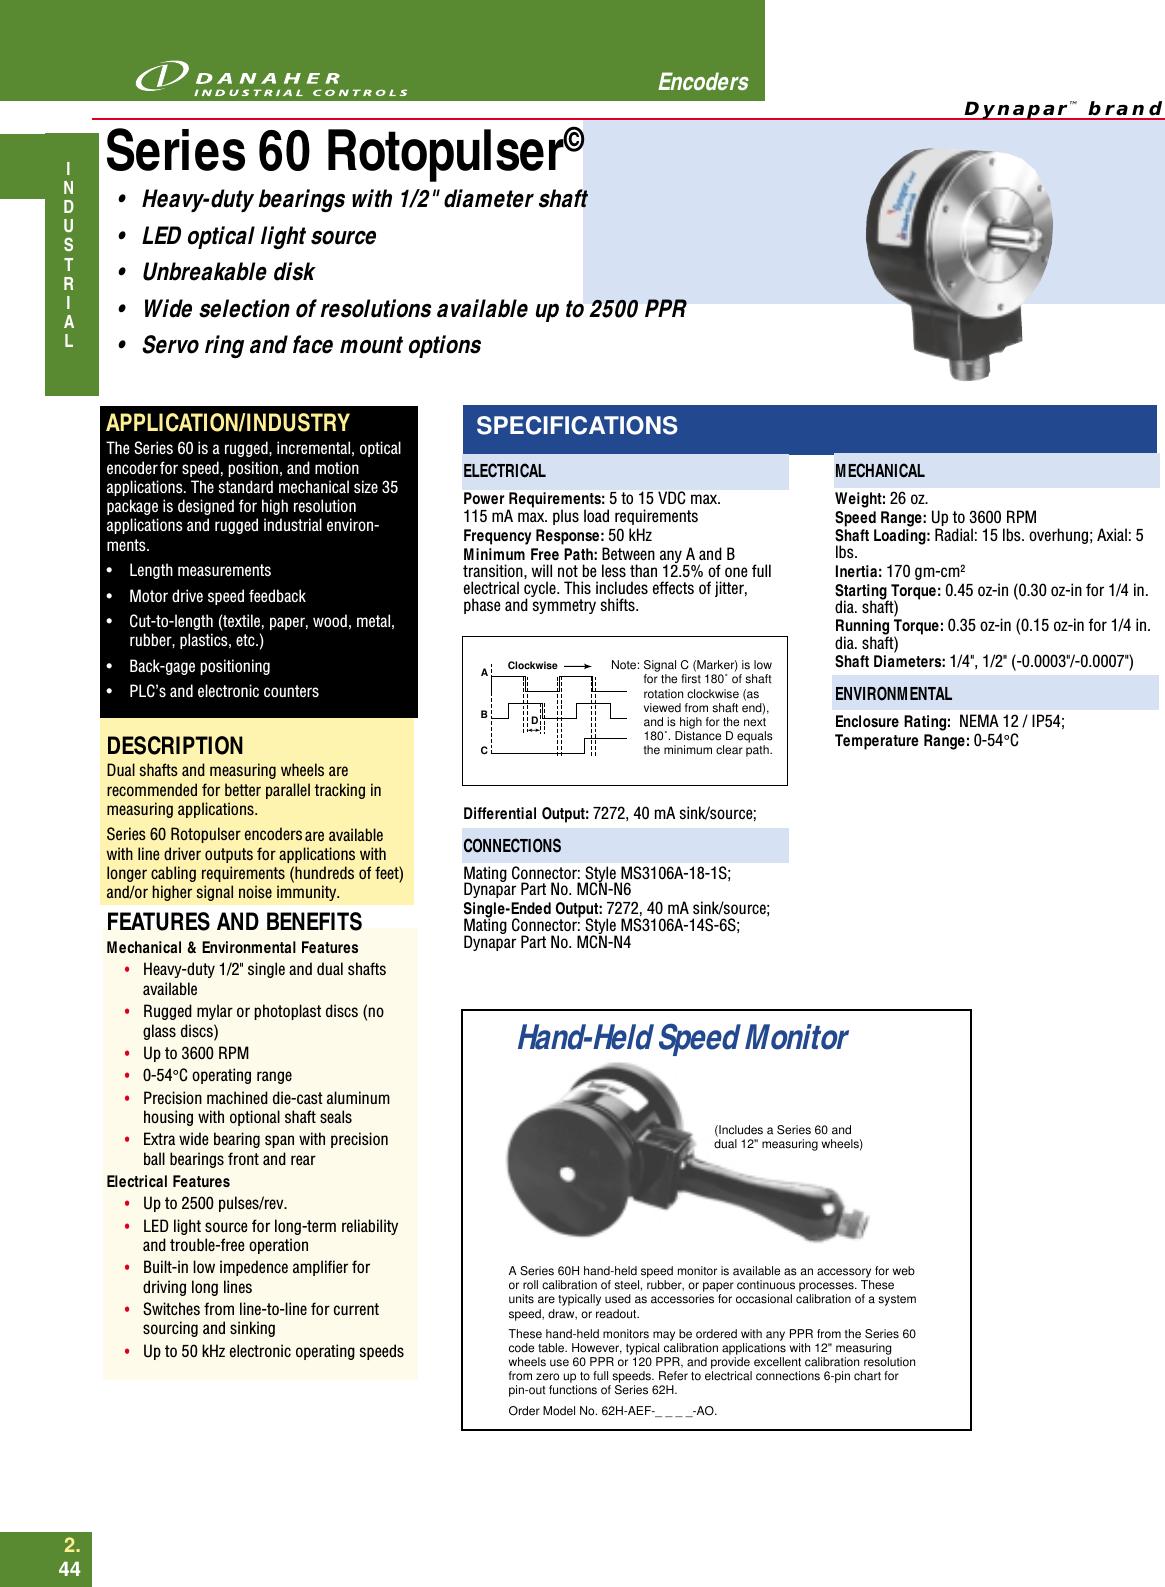 Measuring wheel 16002070010 12 inch x 0.5 Dynapar Unused